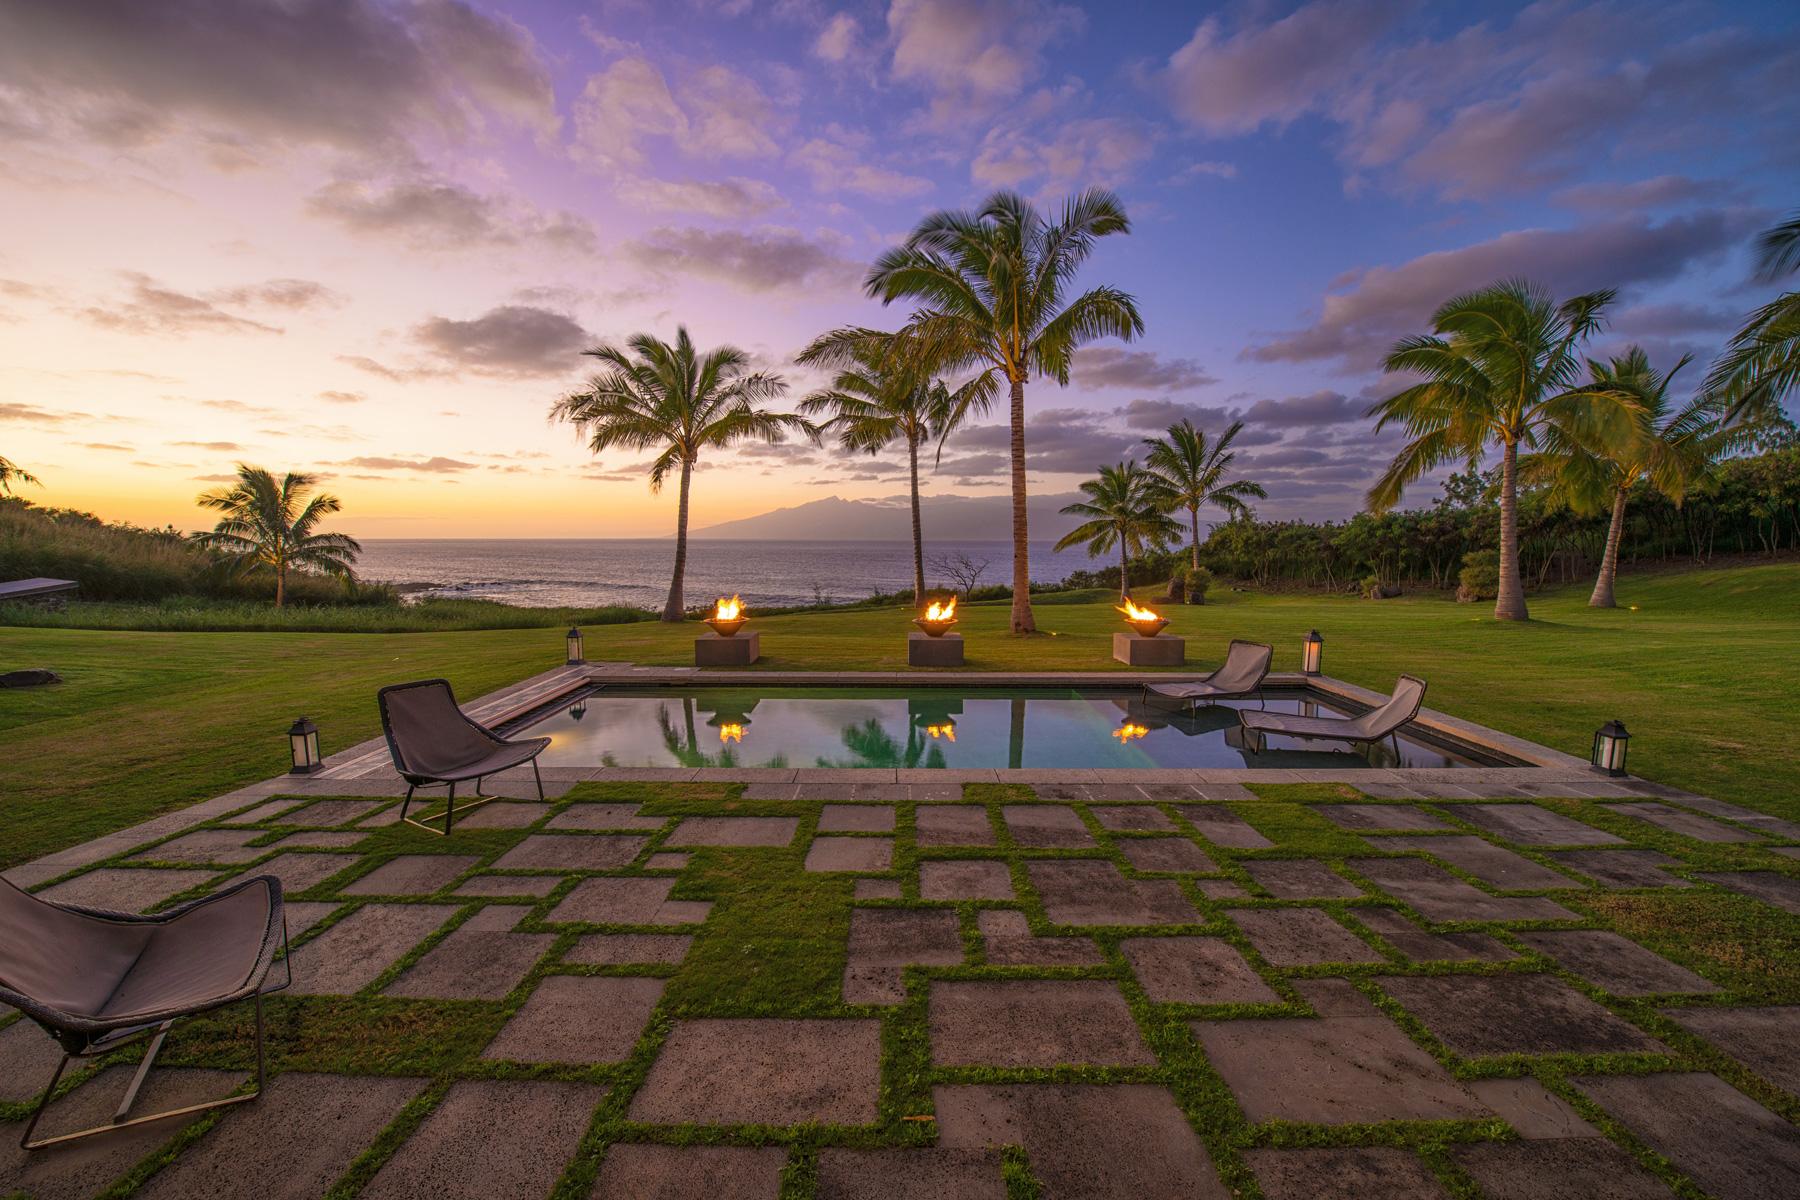 Honolua Bay Kapalua House for Sale Peter Lik Pool